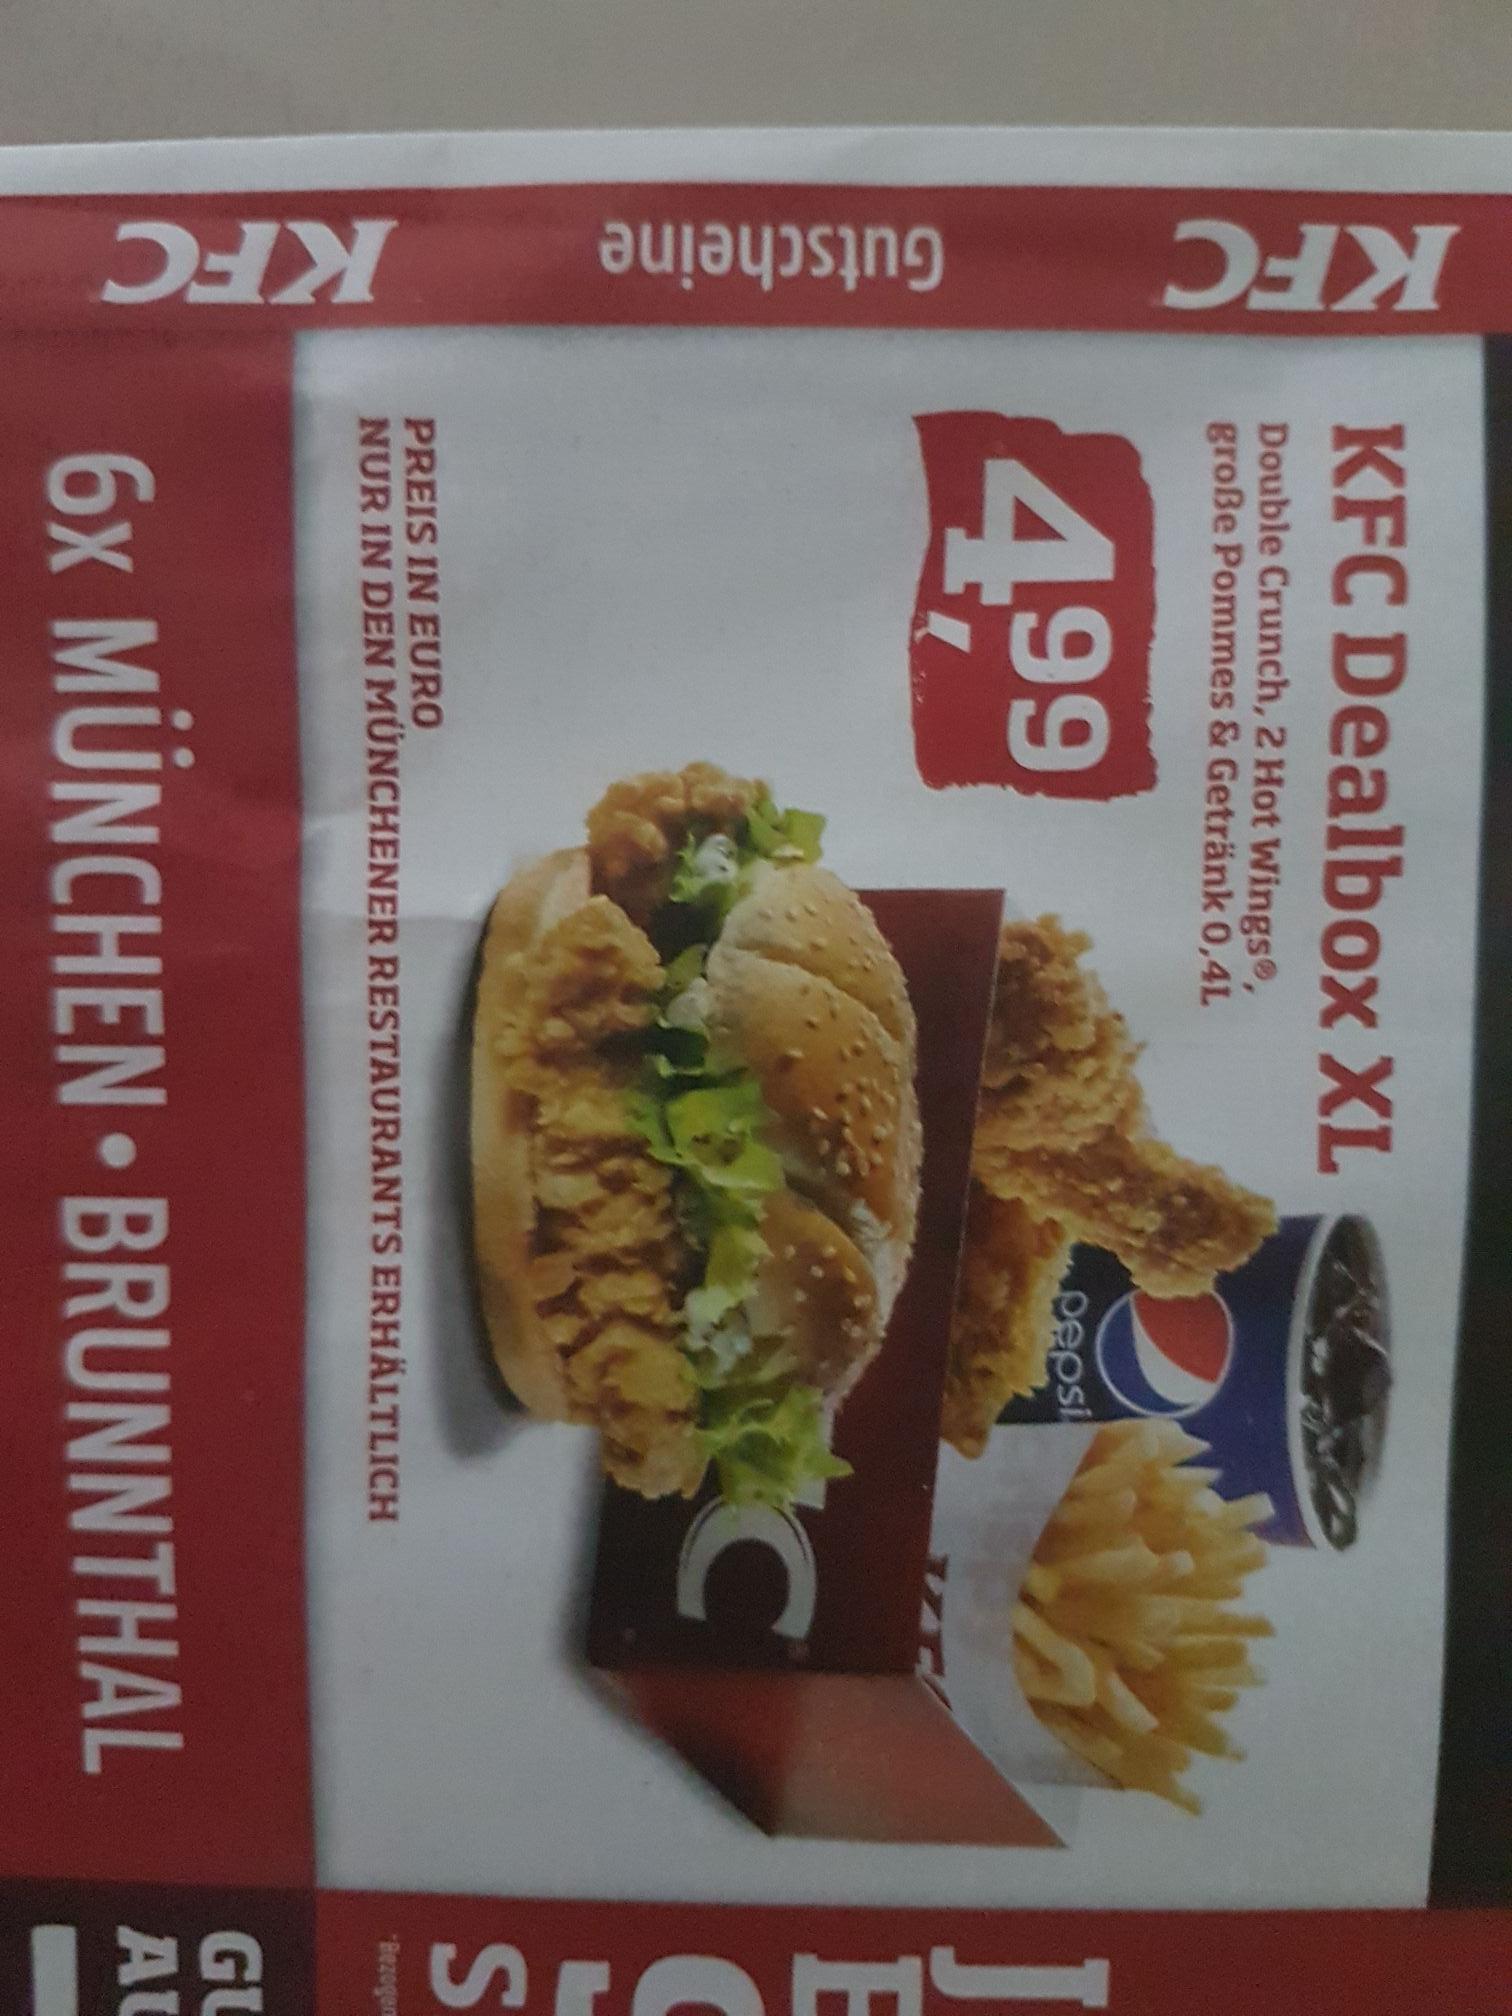 kfc karte Lokal München & Stuttgart] KFC Dealbox XL für 4,99€   mydealz.de kfc karte